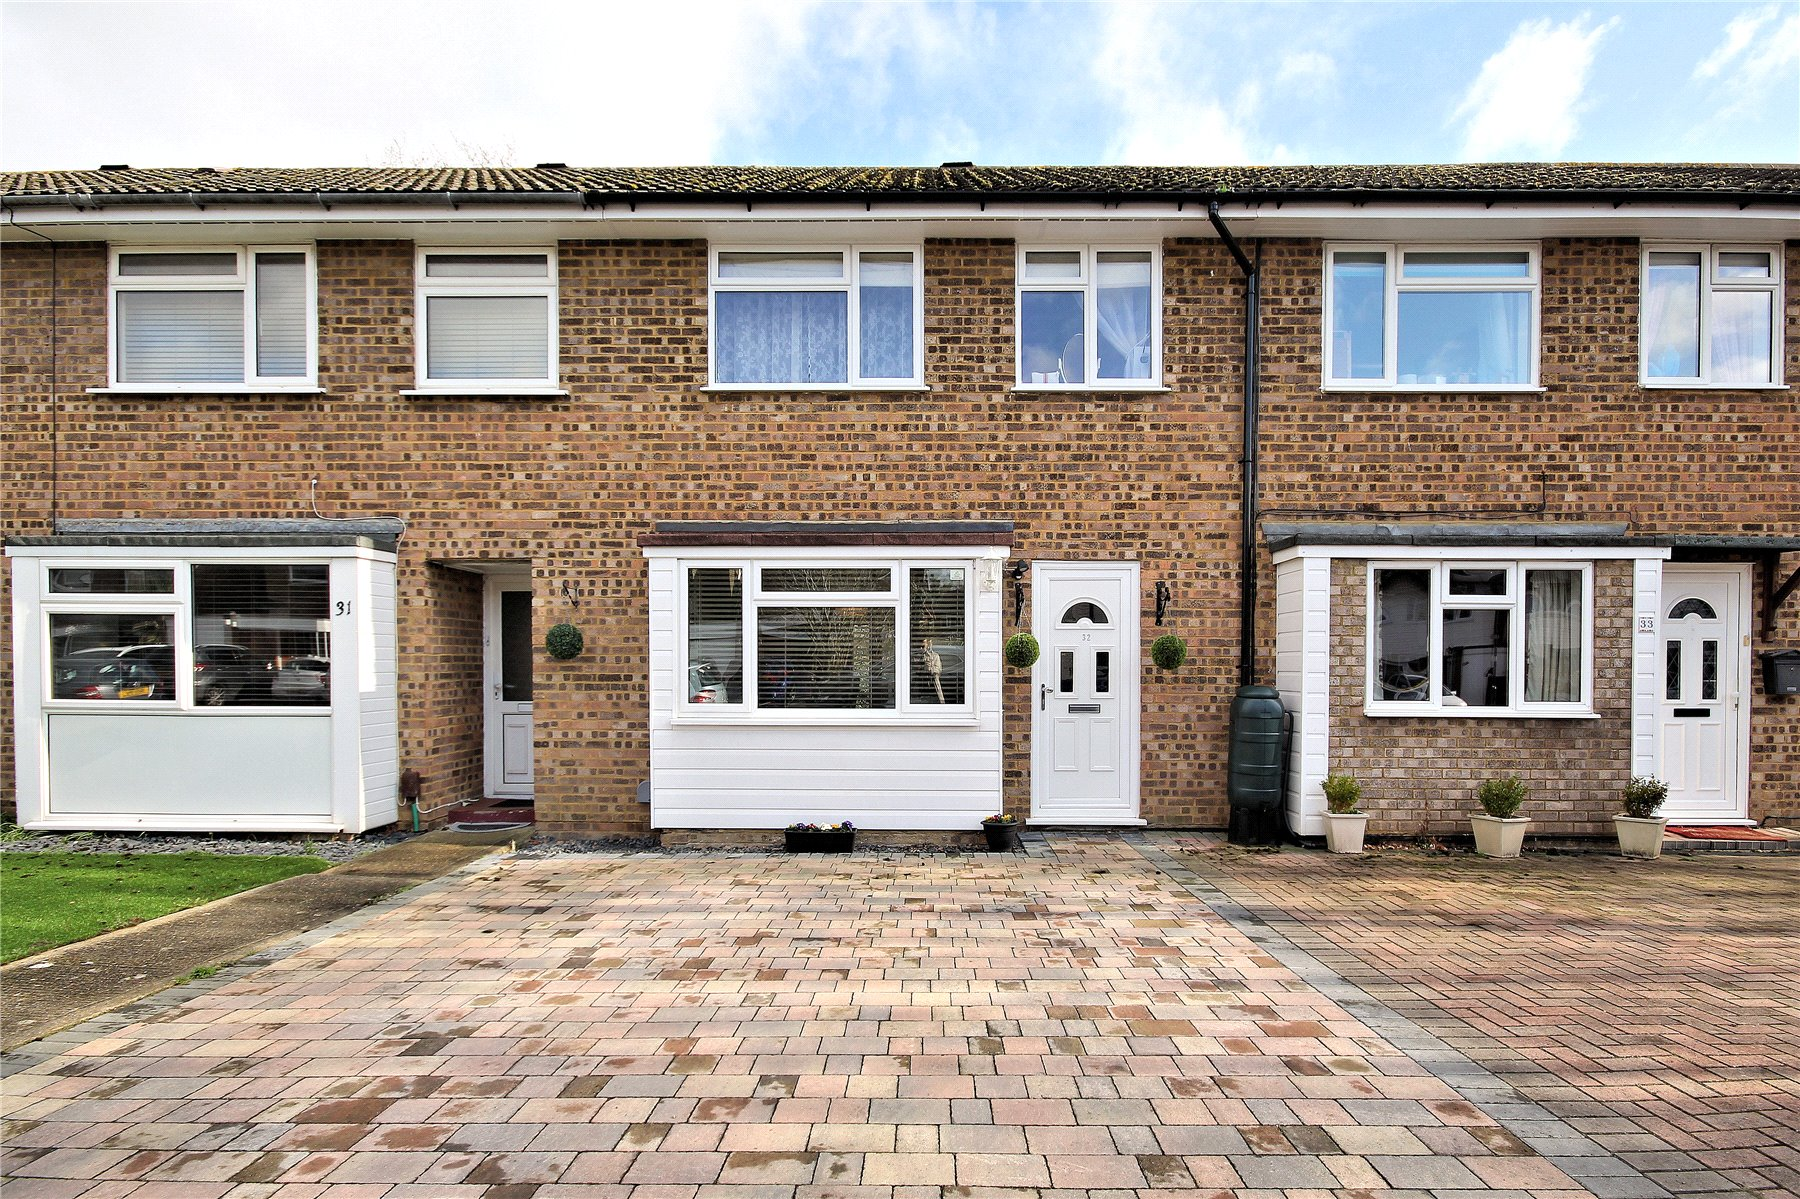 3 Bedrooms Terraced House for sale in Oakfield, Woking, Surrey, GU21